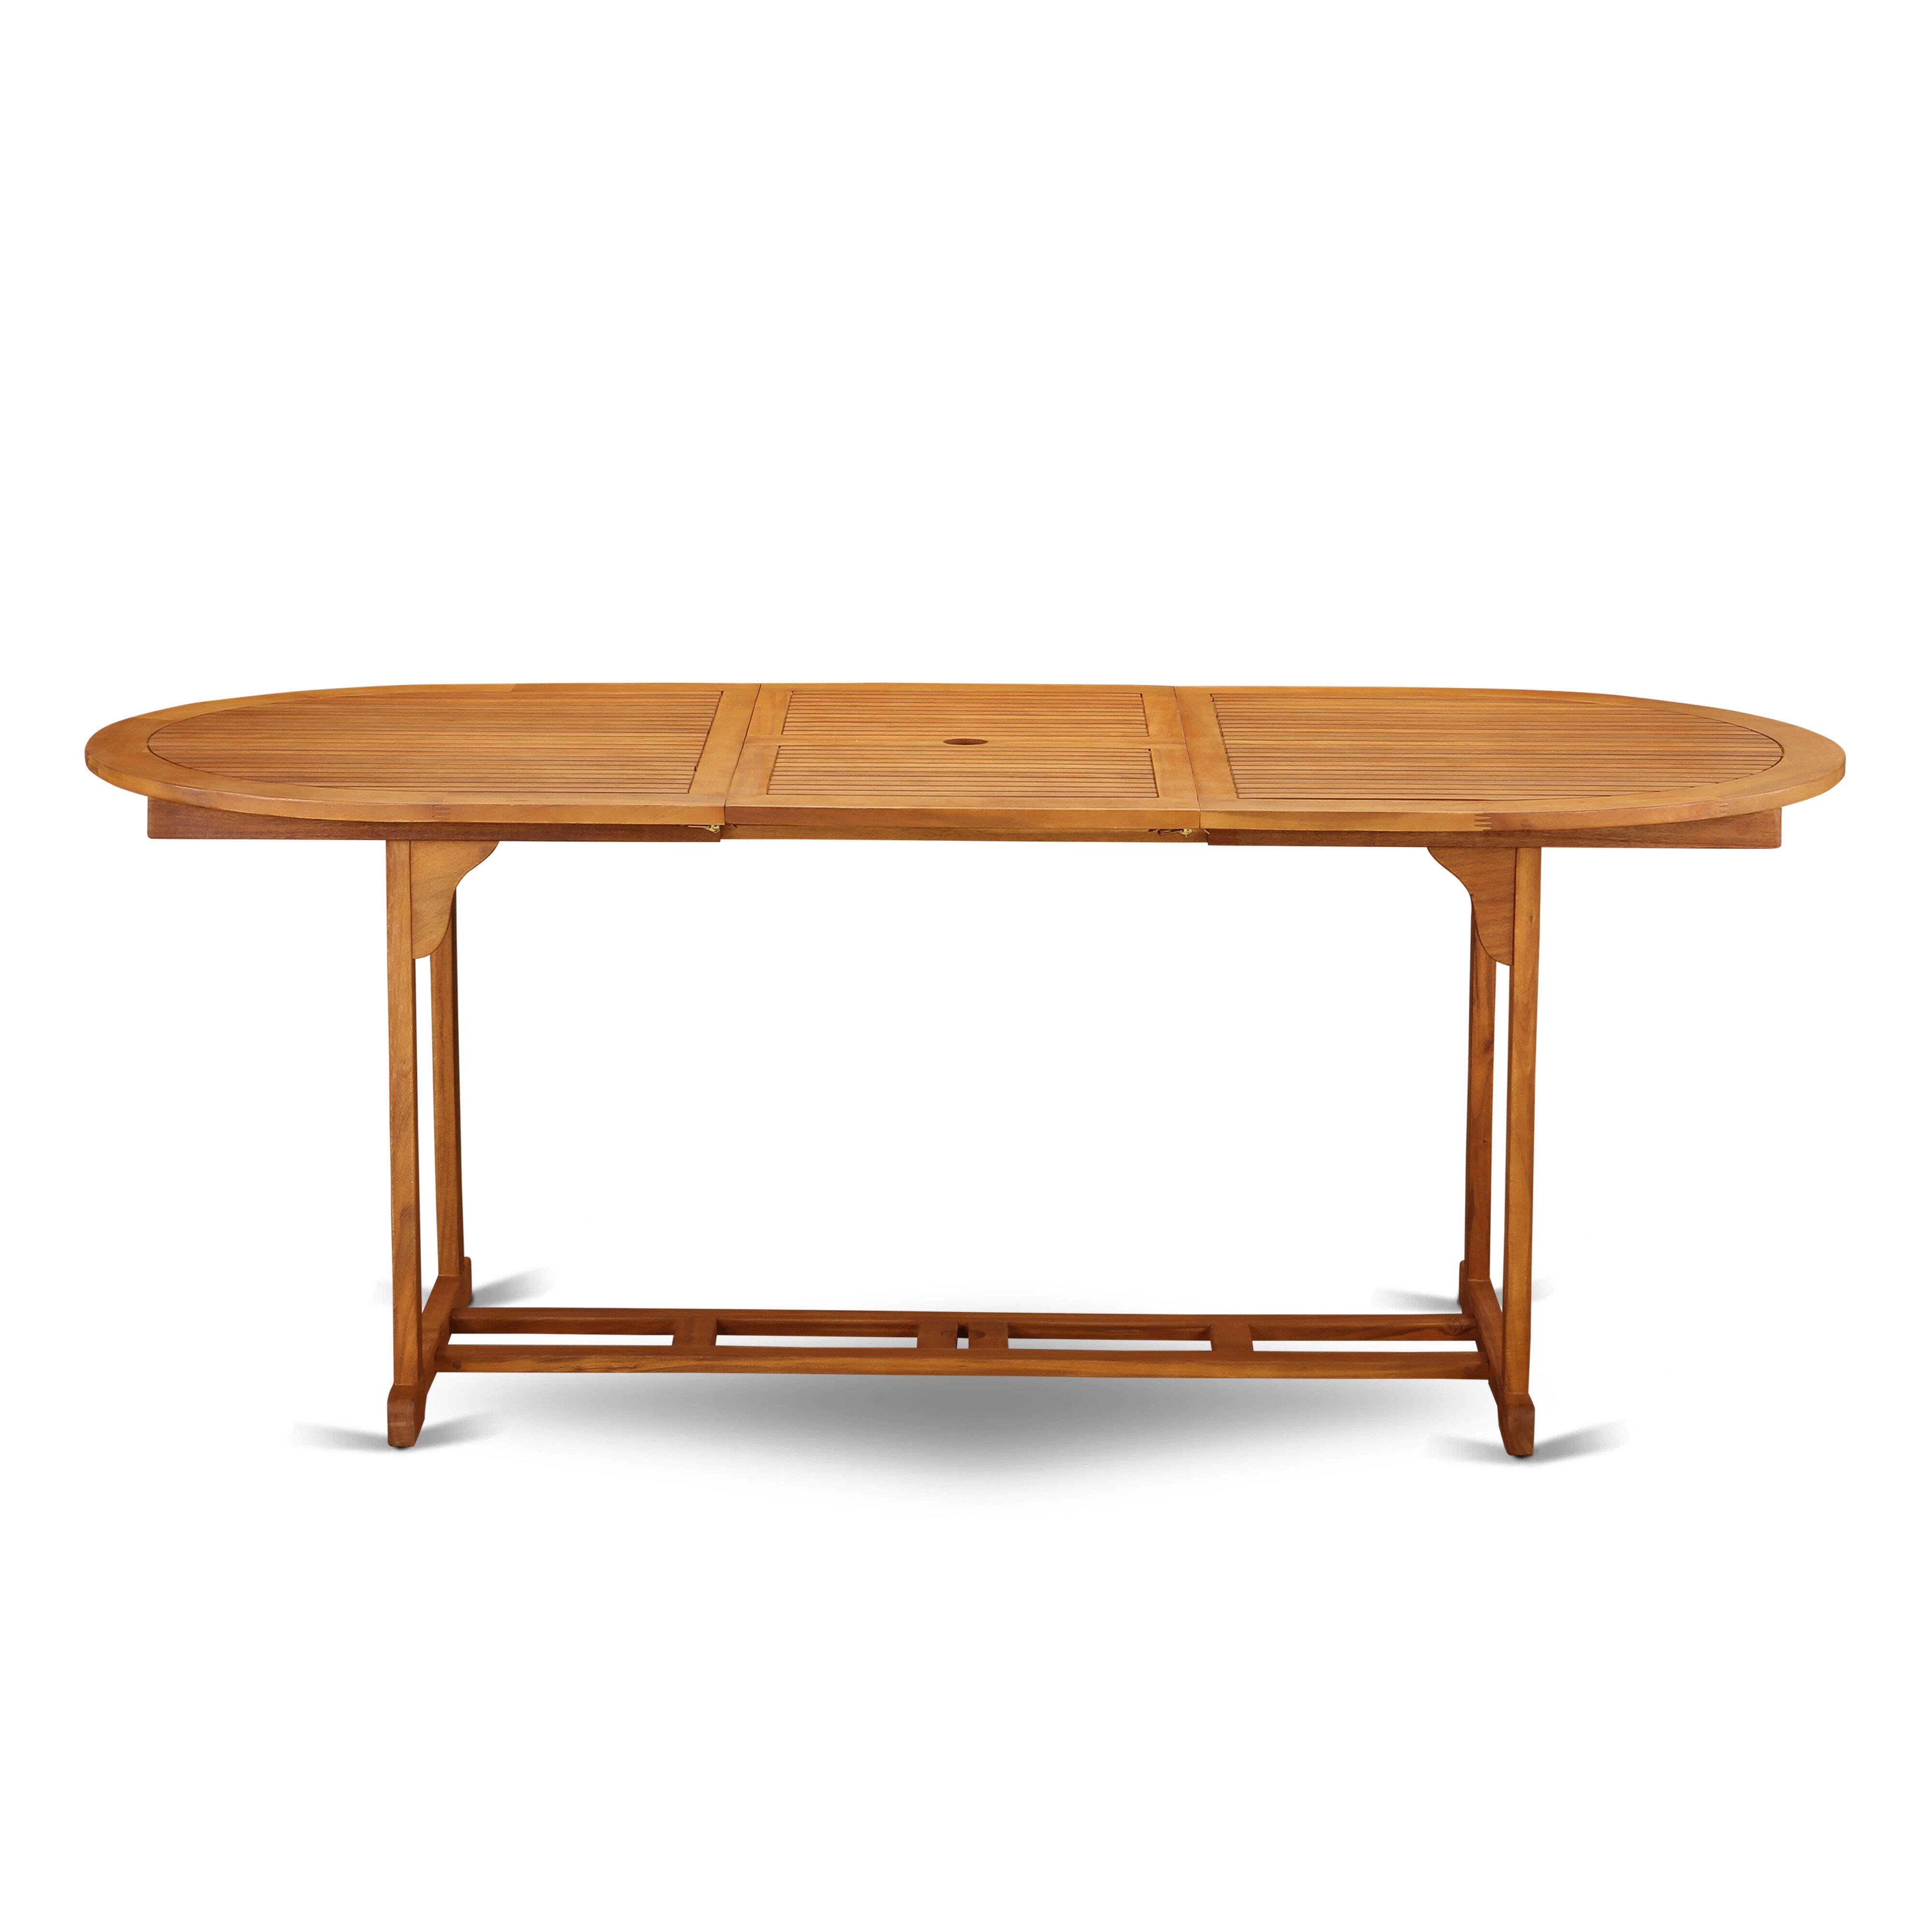 Longshore Tides Rahul Solid Wood Dining Table Reviews Wayfair